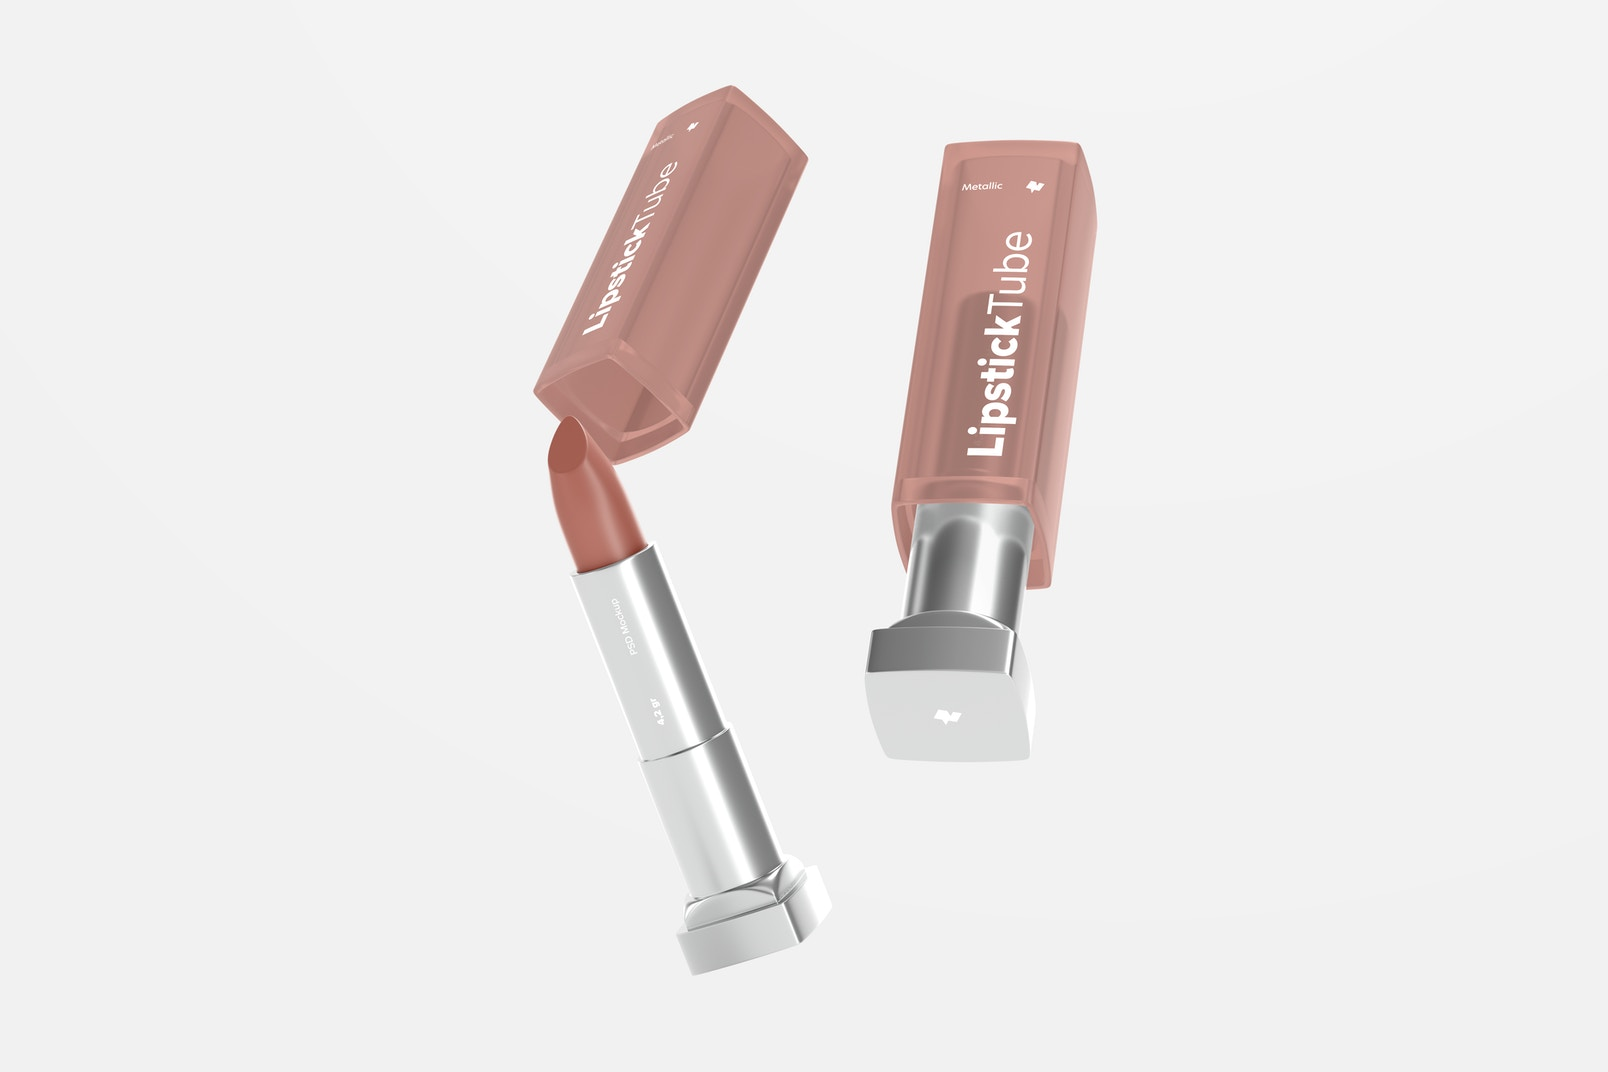 Metallic Lipstick Tubes Mockup, Falling